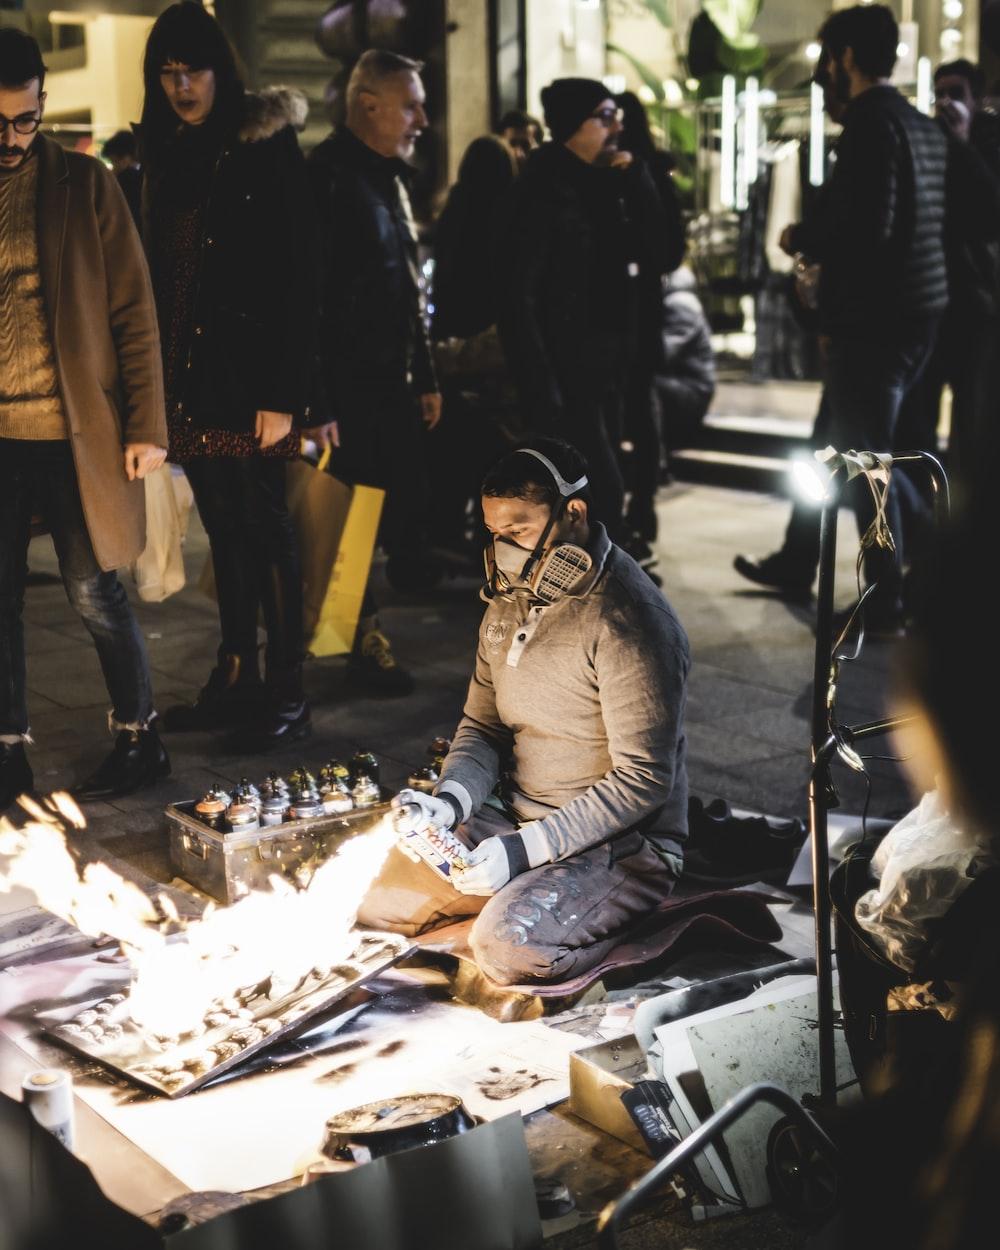 kneeling man torching artwork on canvas near people